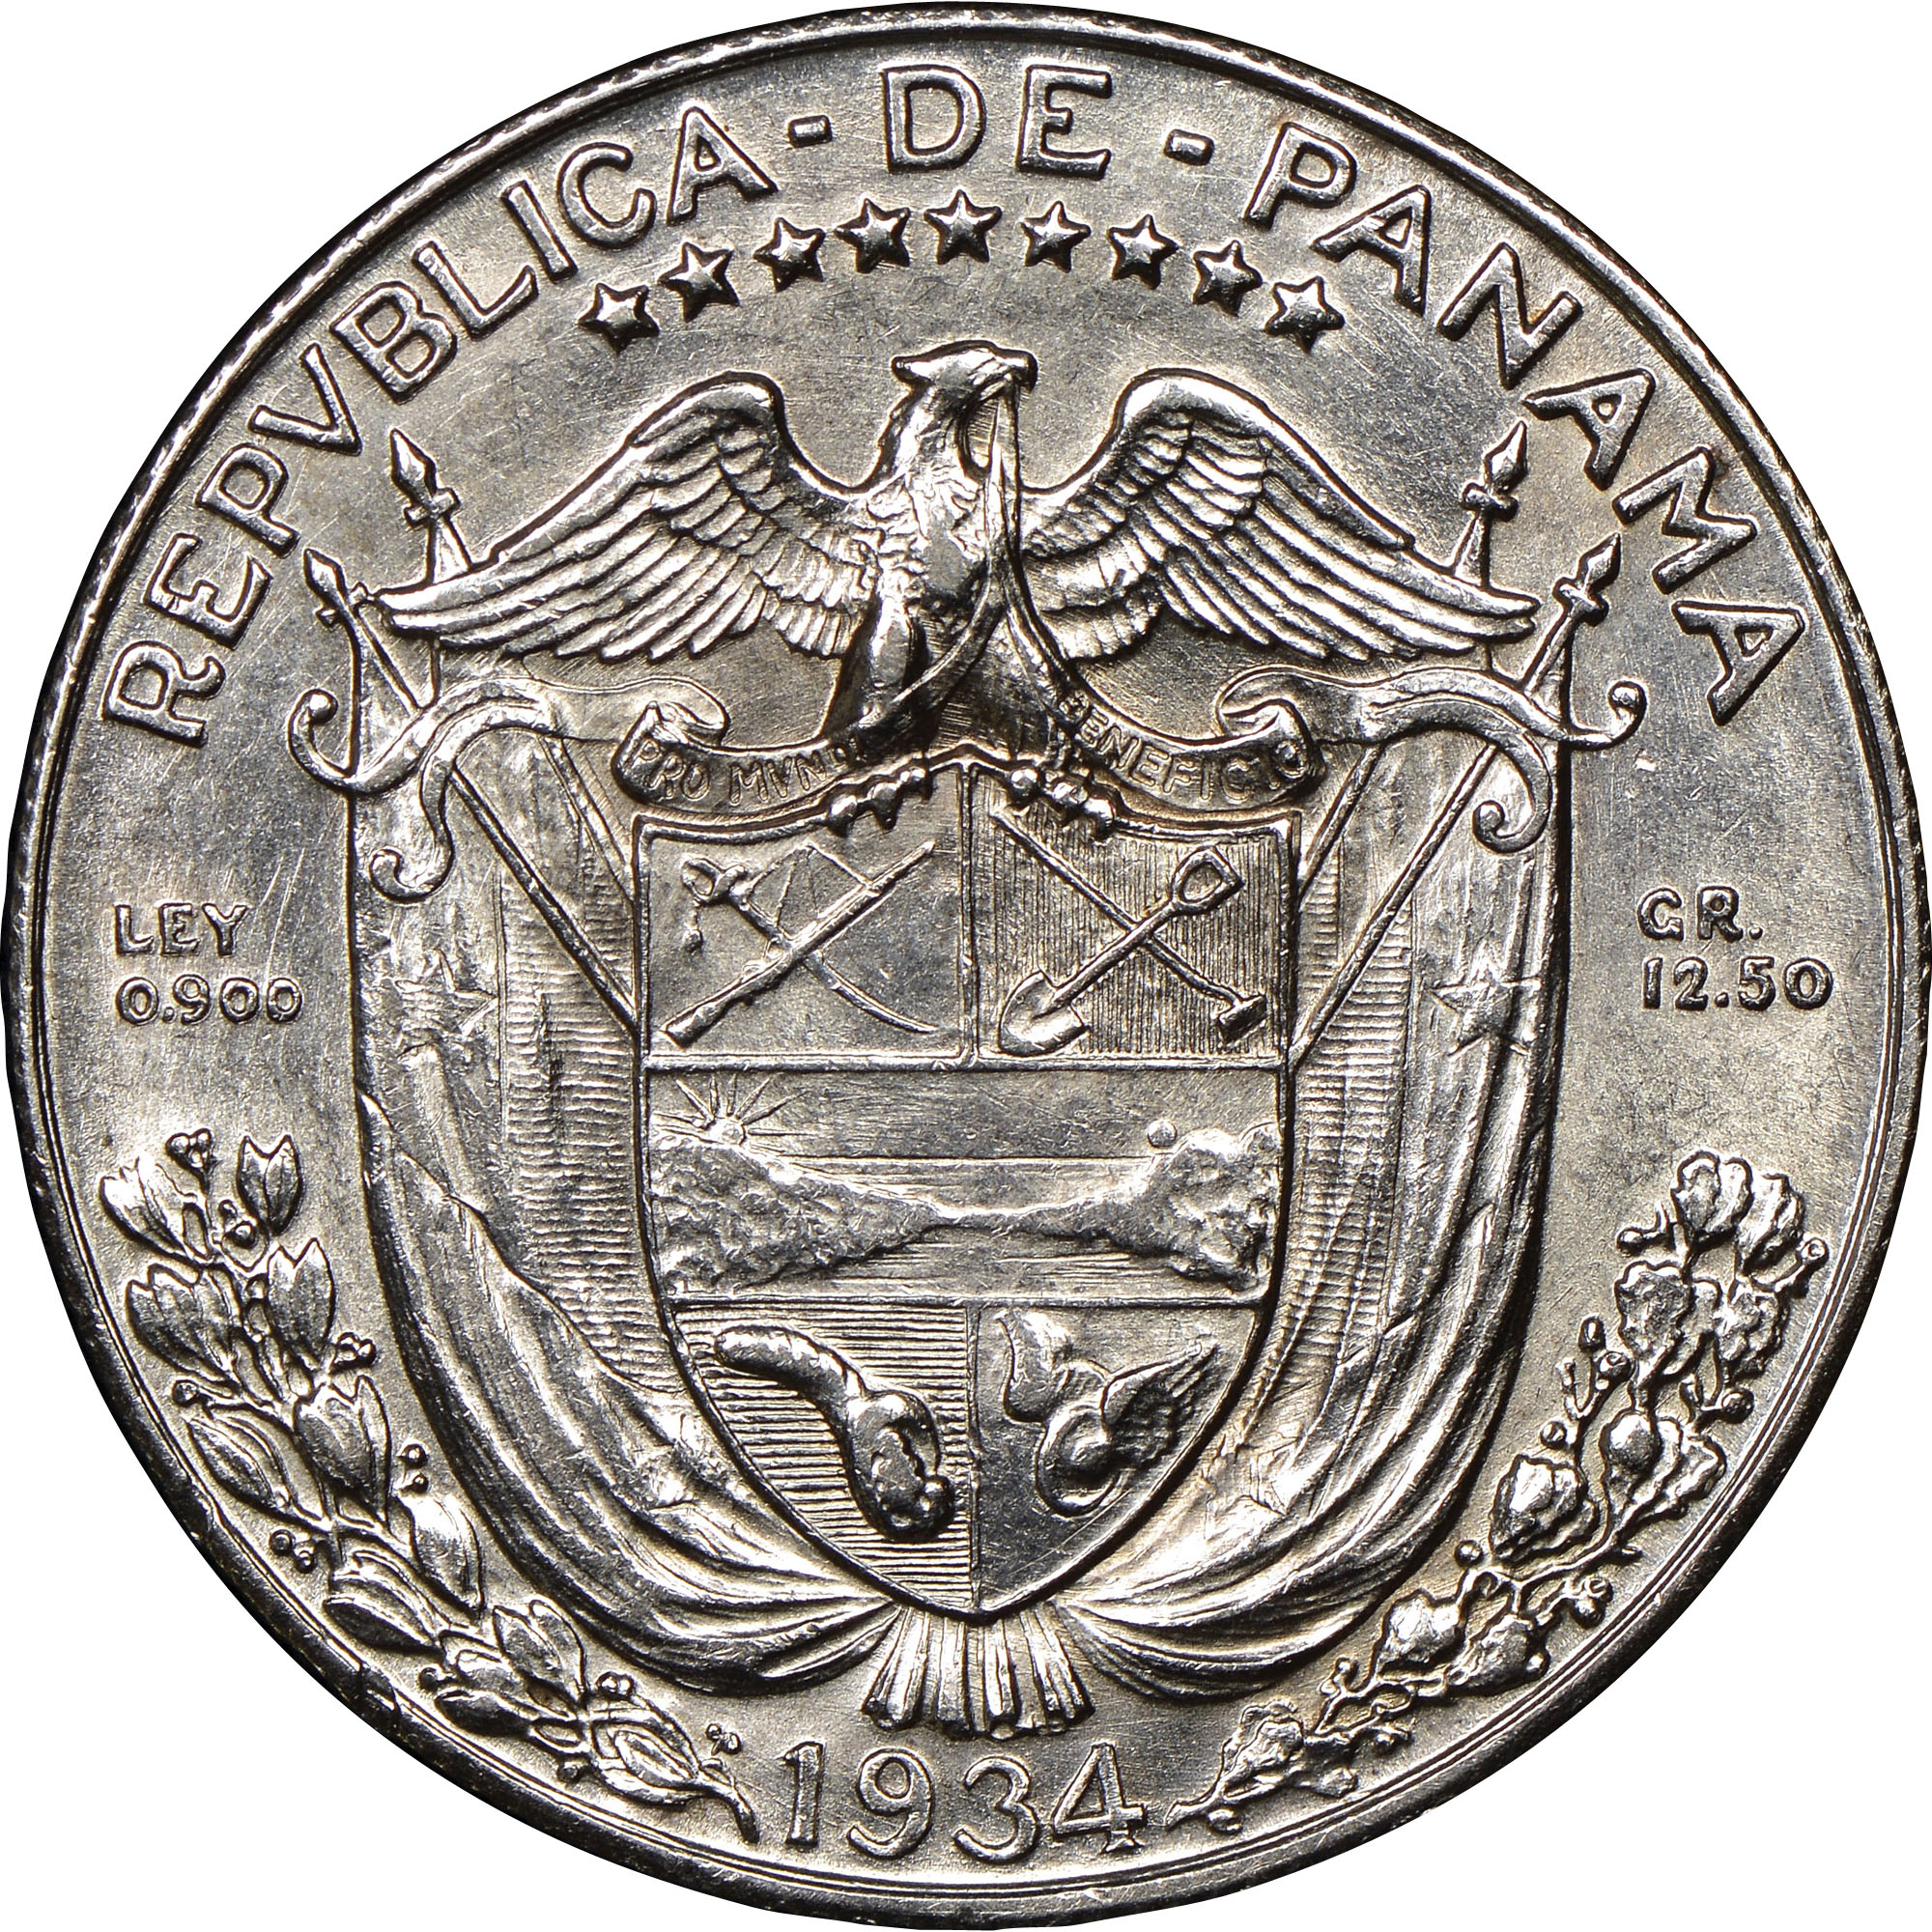 Panama 1 2 Balboa Km 12 1 Prices Amp Values Ngc